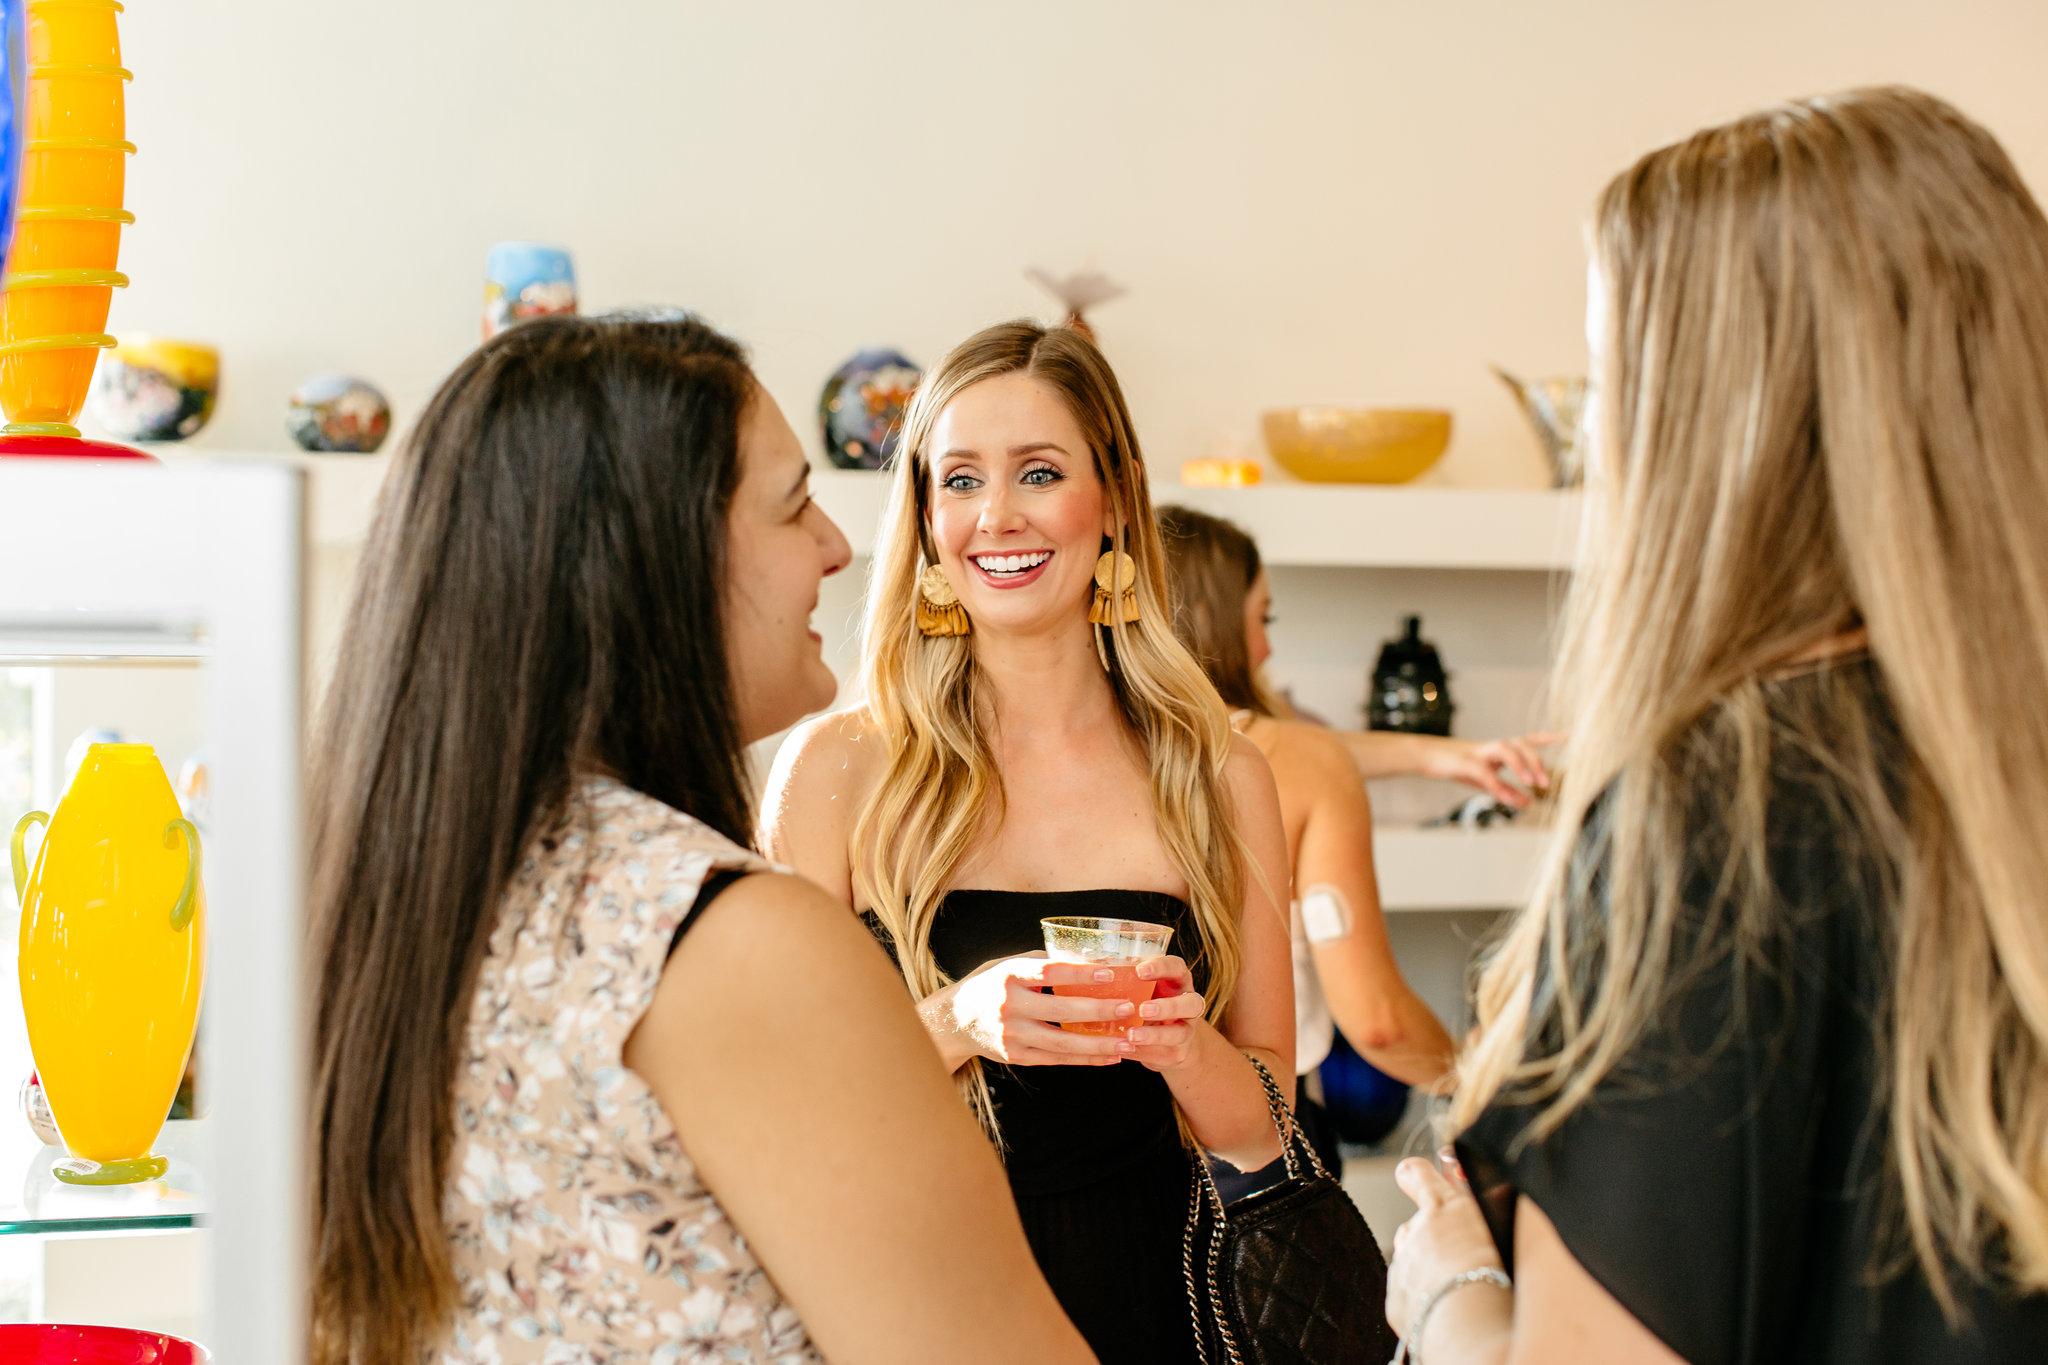 Alexa-Vossler-Photo_Dallas-Event-Photographer_Brite-Bar-Beauty-2018-Lipstick-Launch-Party-118.jpg